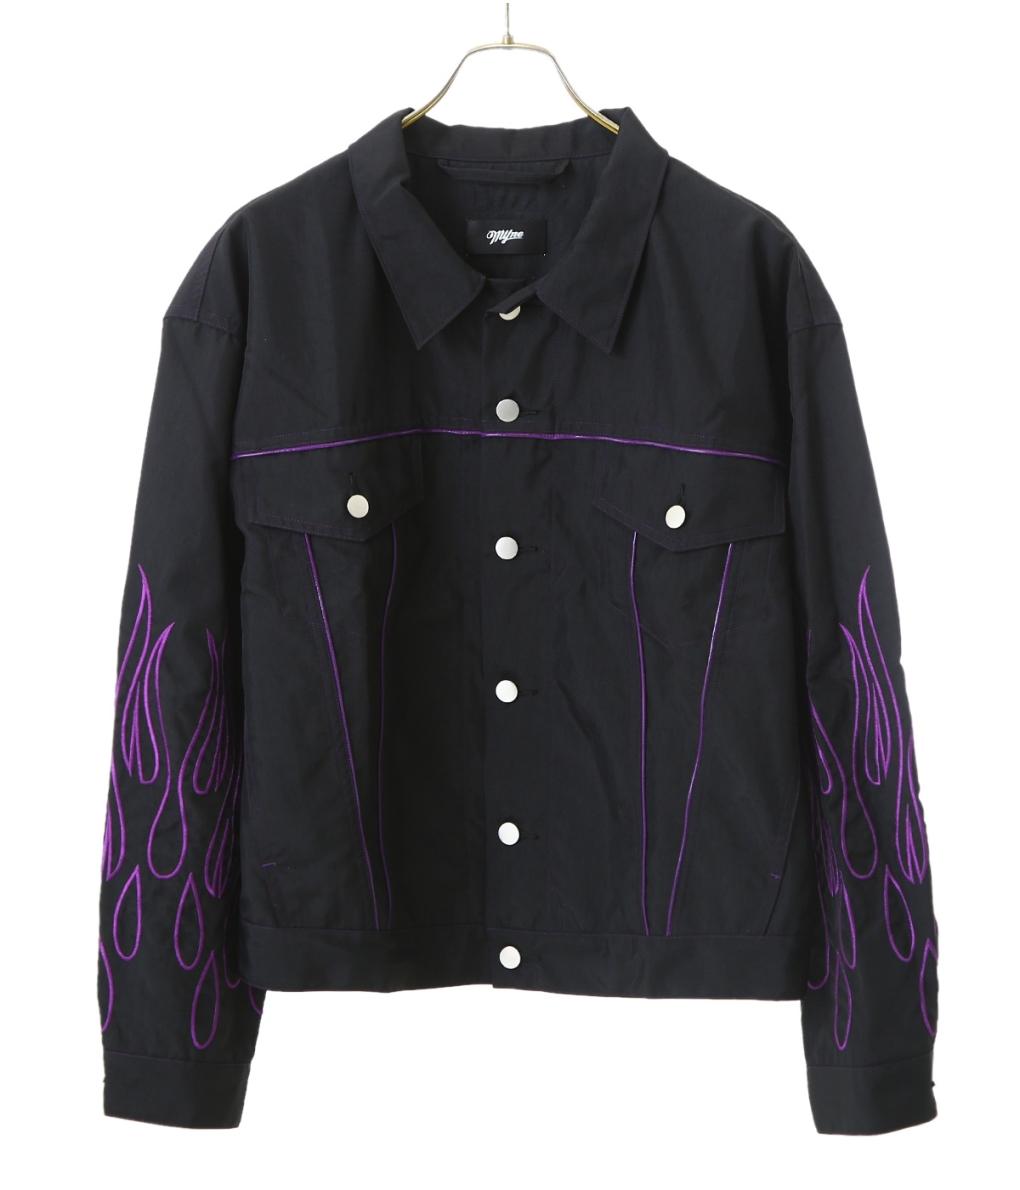 MYne / マイン : Fire Nylon Jacket : ファイヤー ナイロン ジャケット 19SS 19春夏 : G02JK231 【WAX】